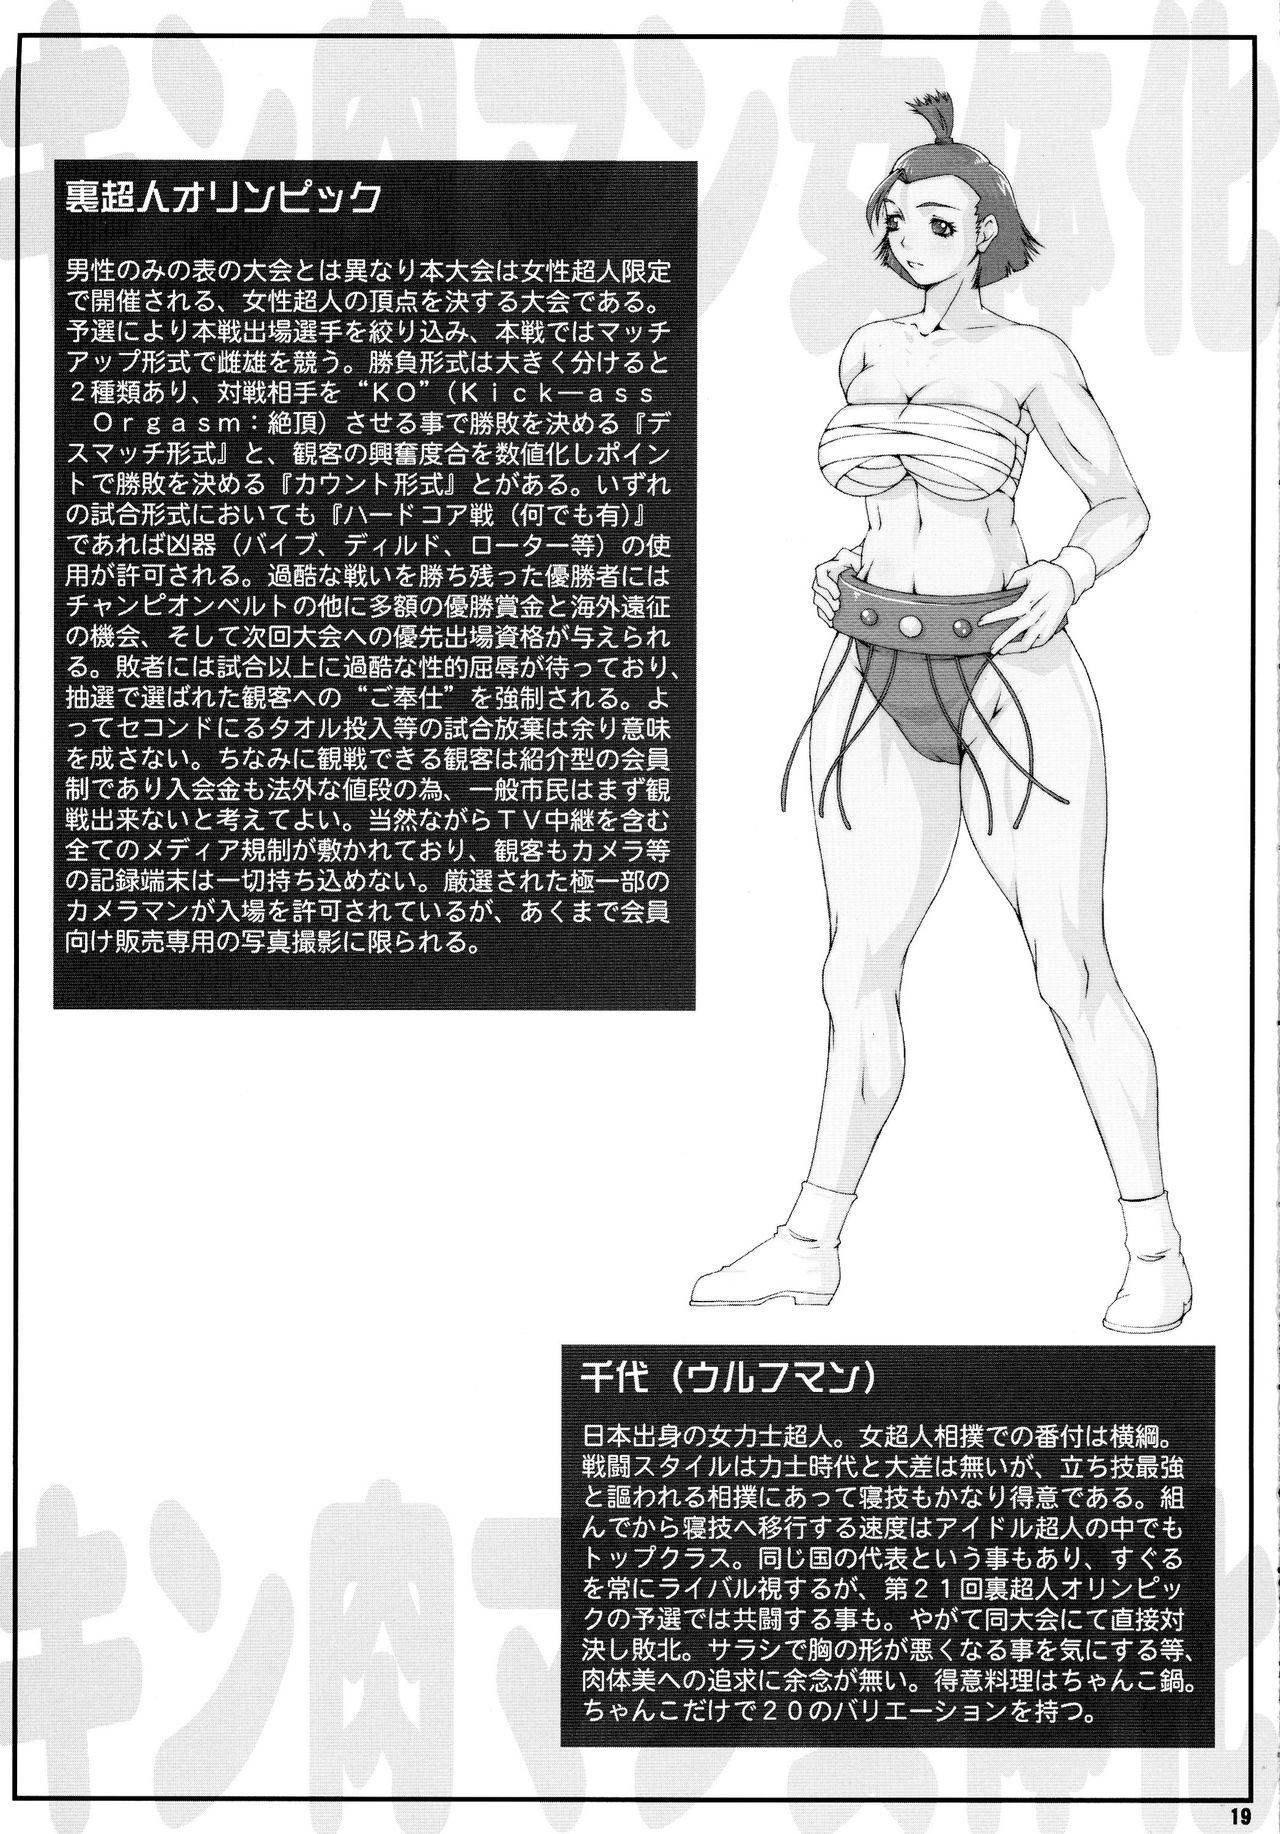 Misoka no 5 18